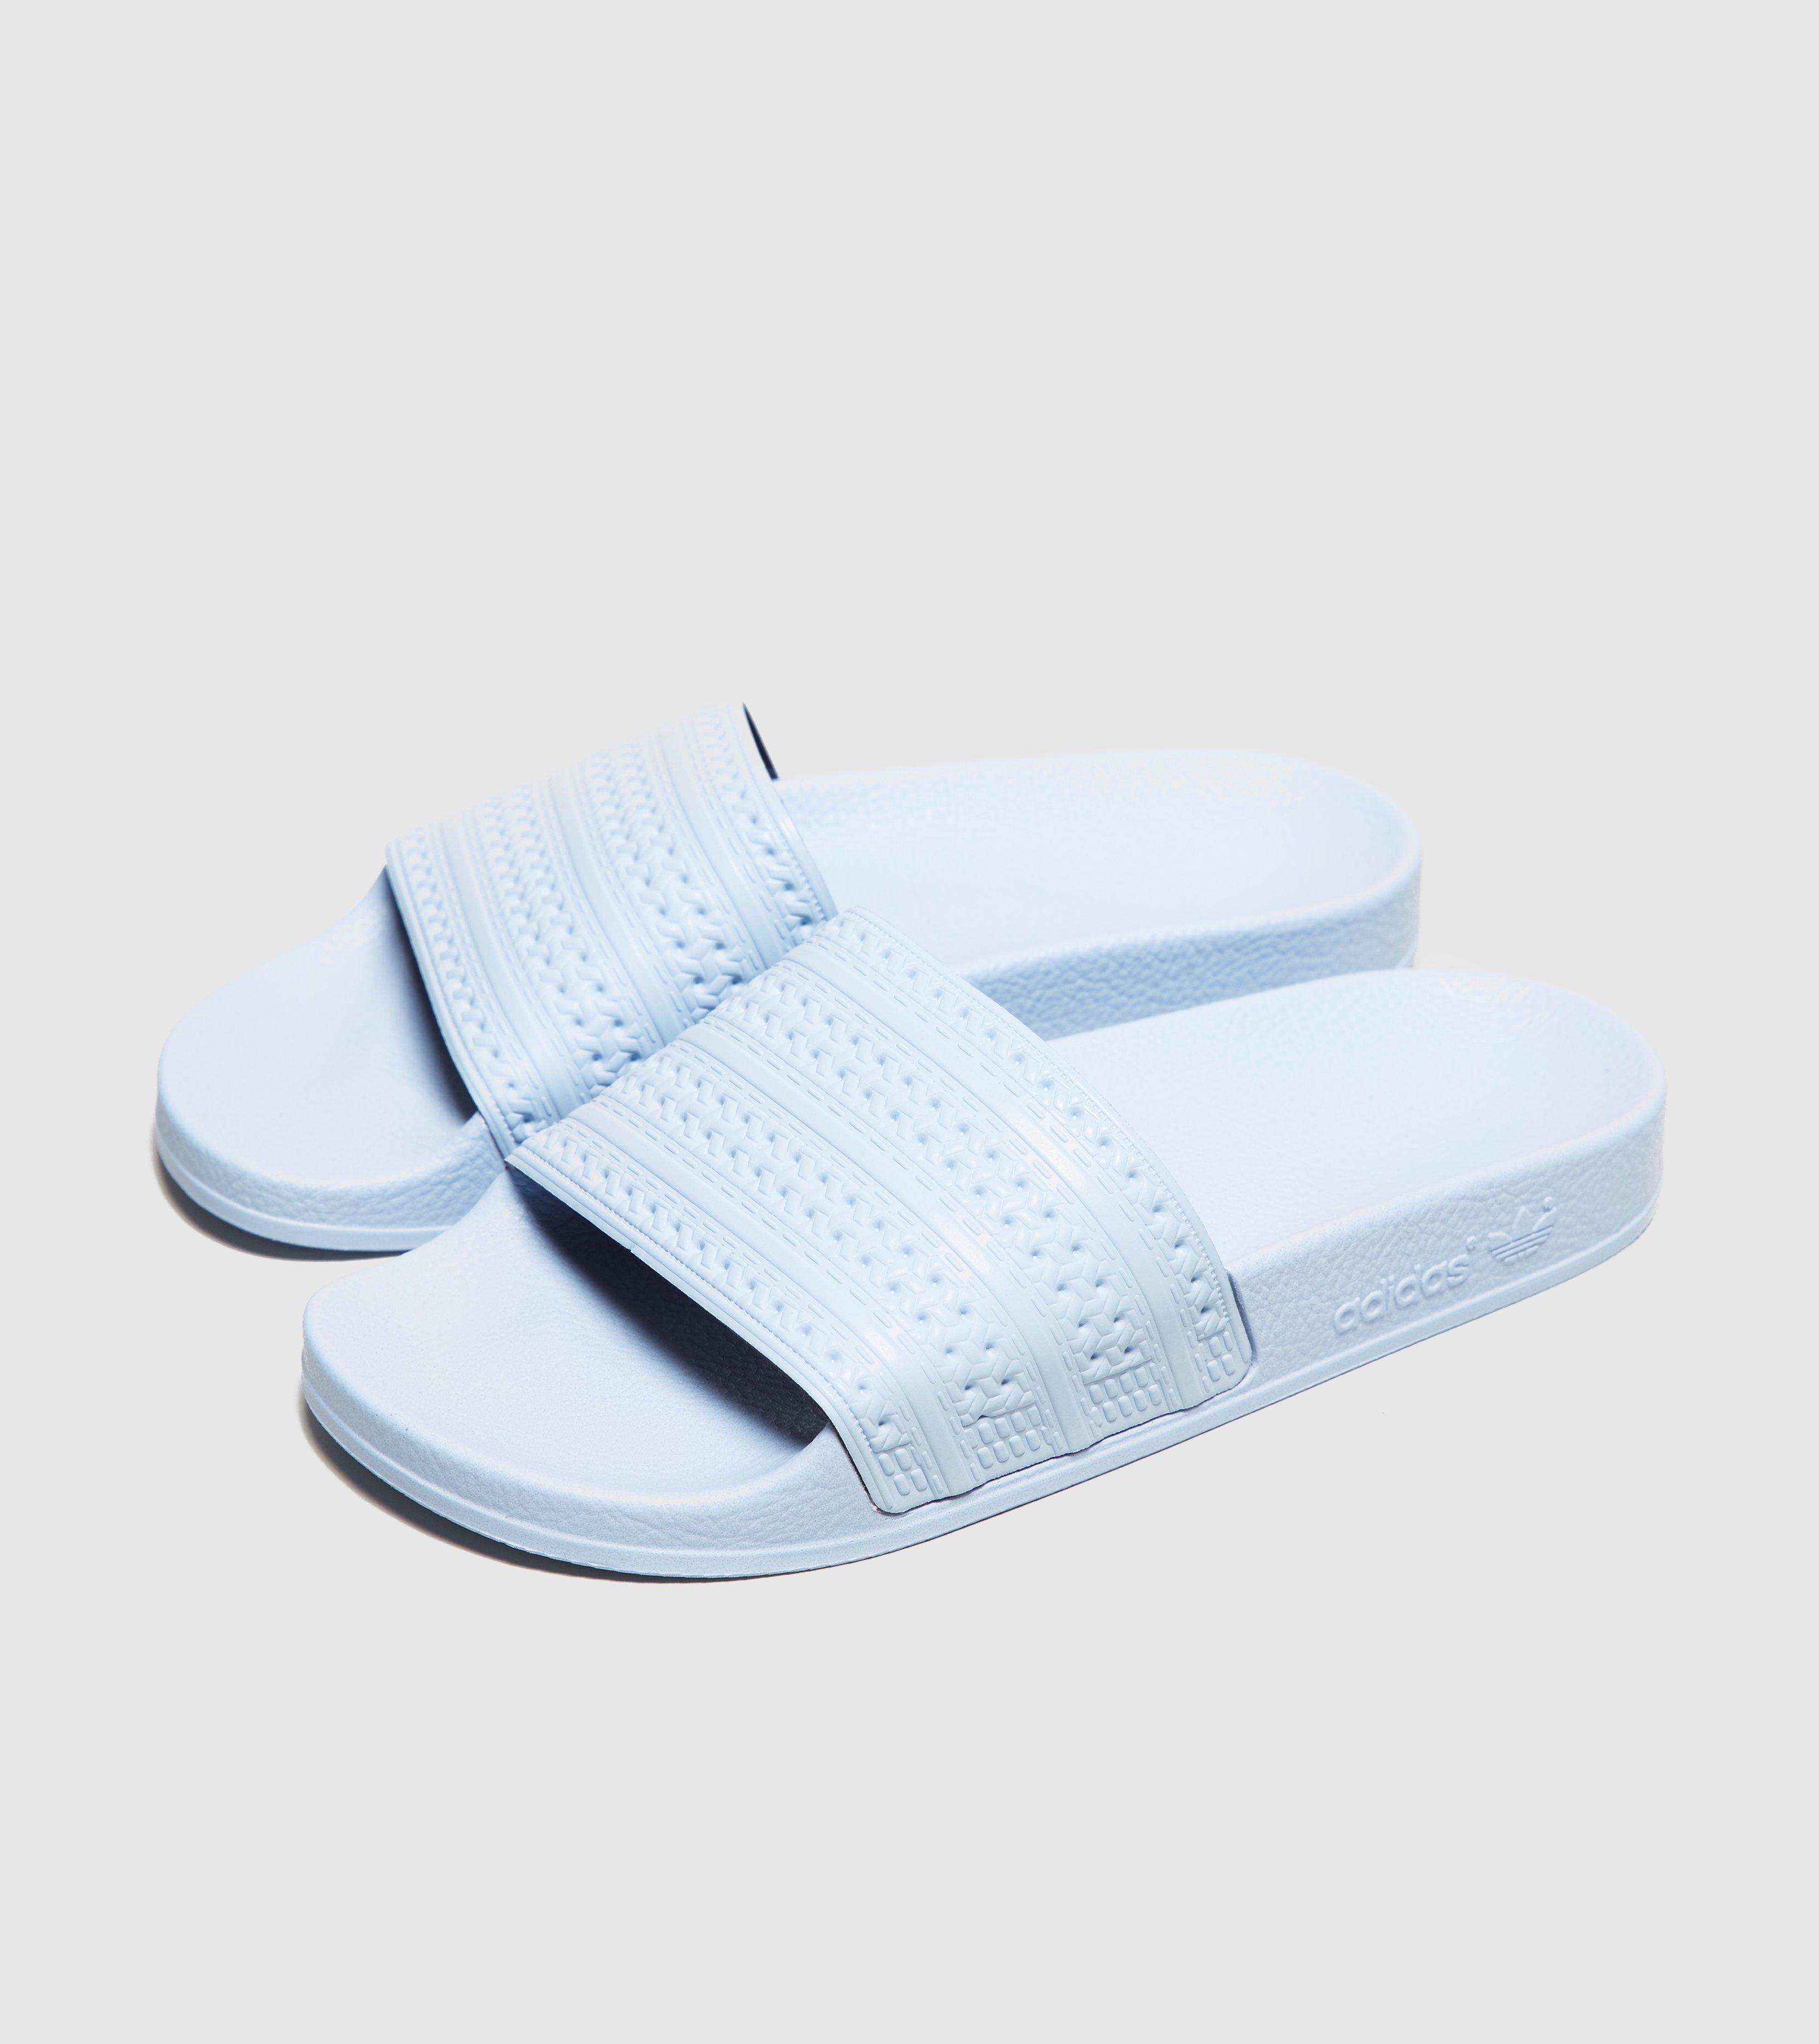 discount sale 59e86 8e06c adidas Originals Adilette Slides Women s in Blue - Lyst